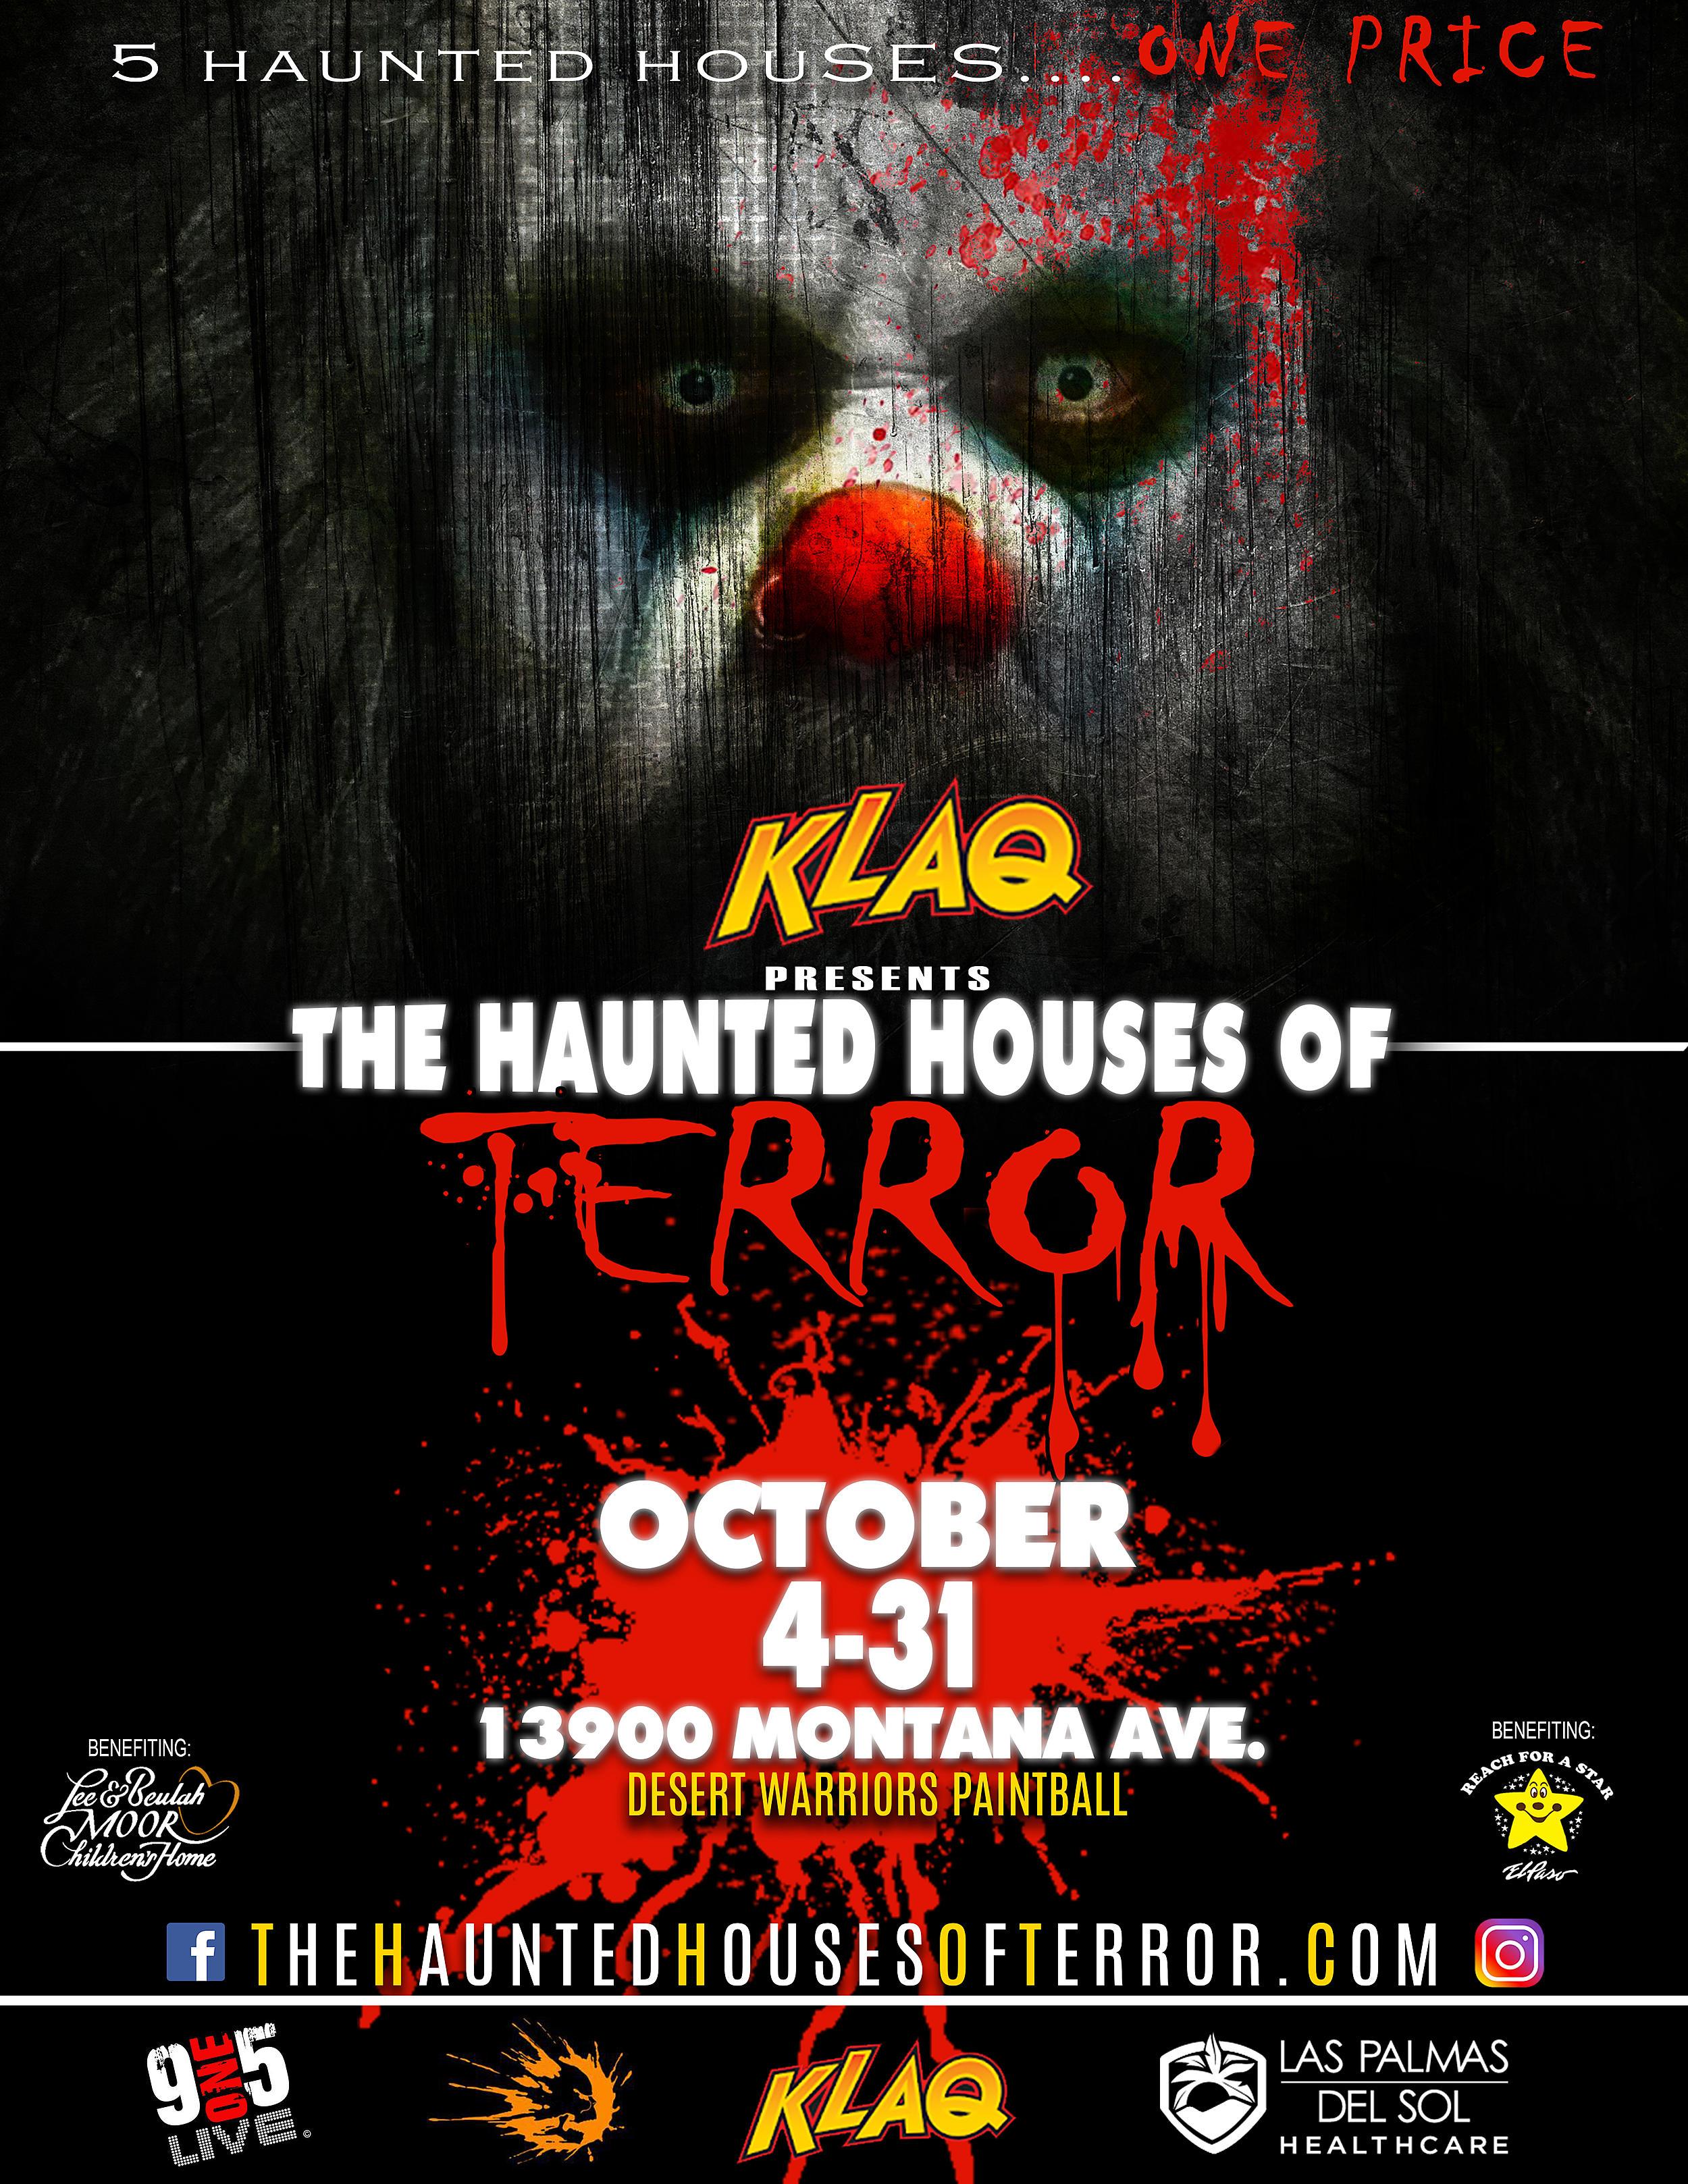 KLAQ Presents Haunted Houses of Terror